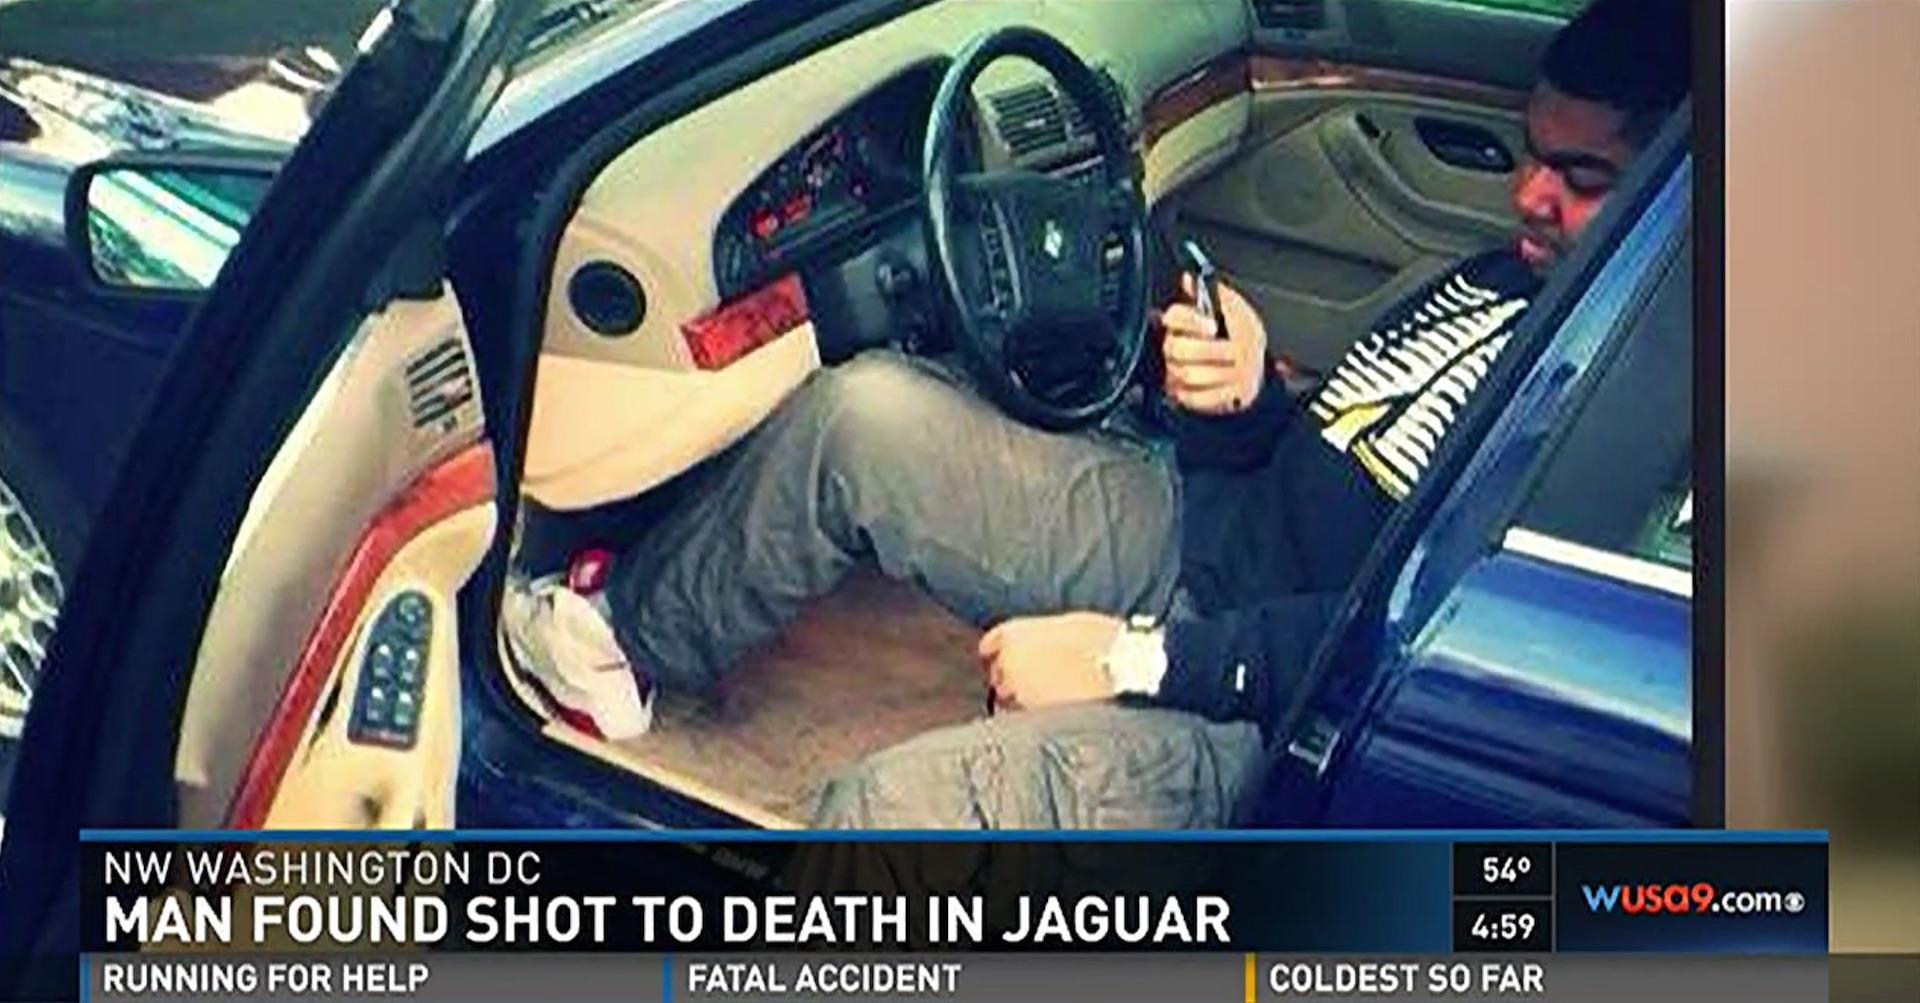 Man shot and killed inside his Jaguar in Northwest Washington - The